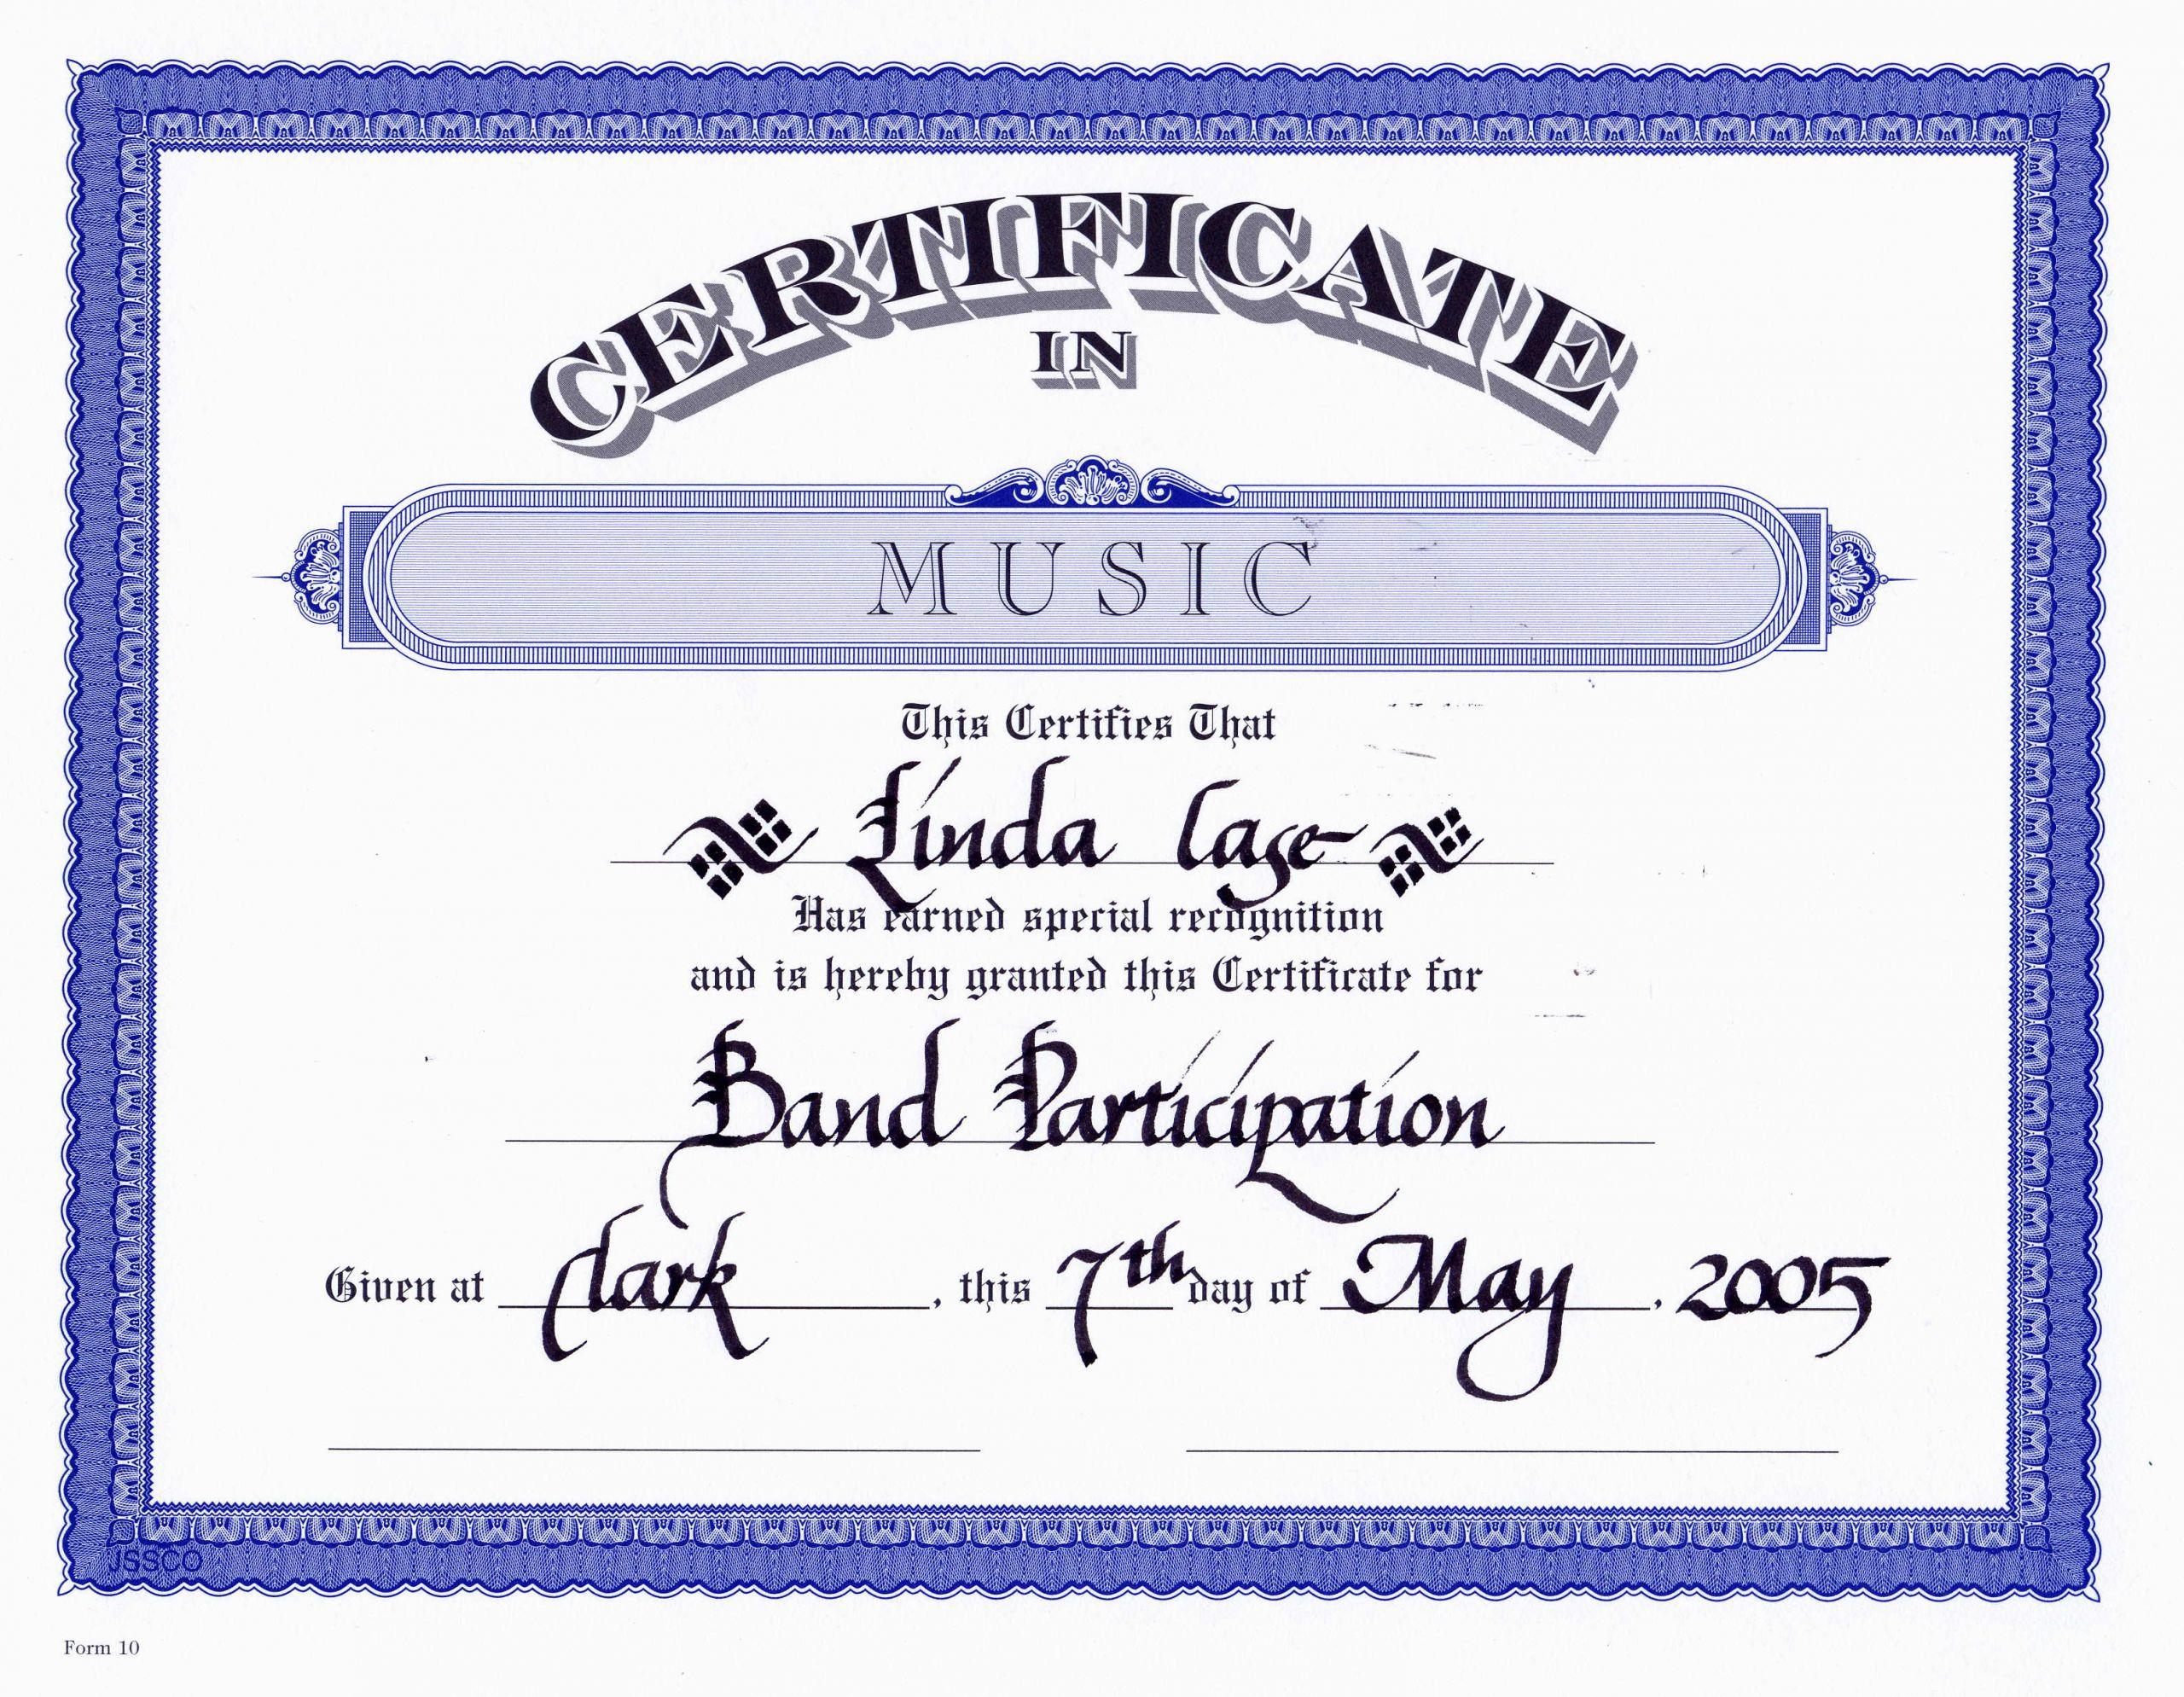 Free Music Certificate Templates Beautiful Certificate Templates Free Editable Music Certificate